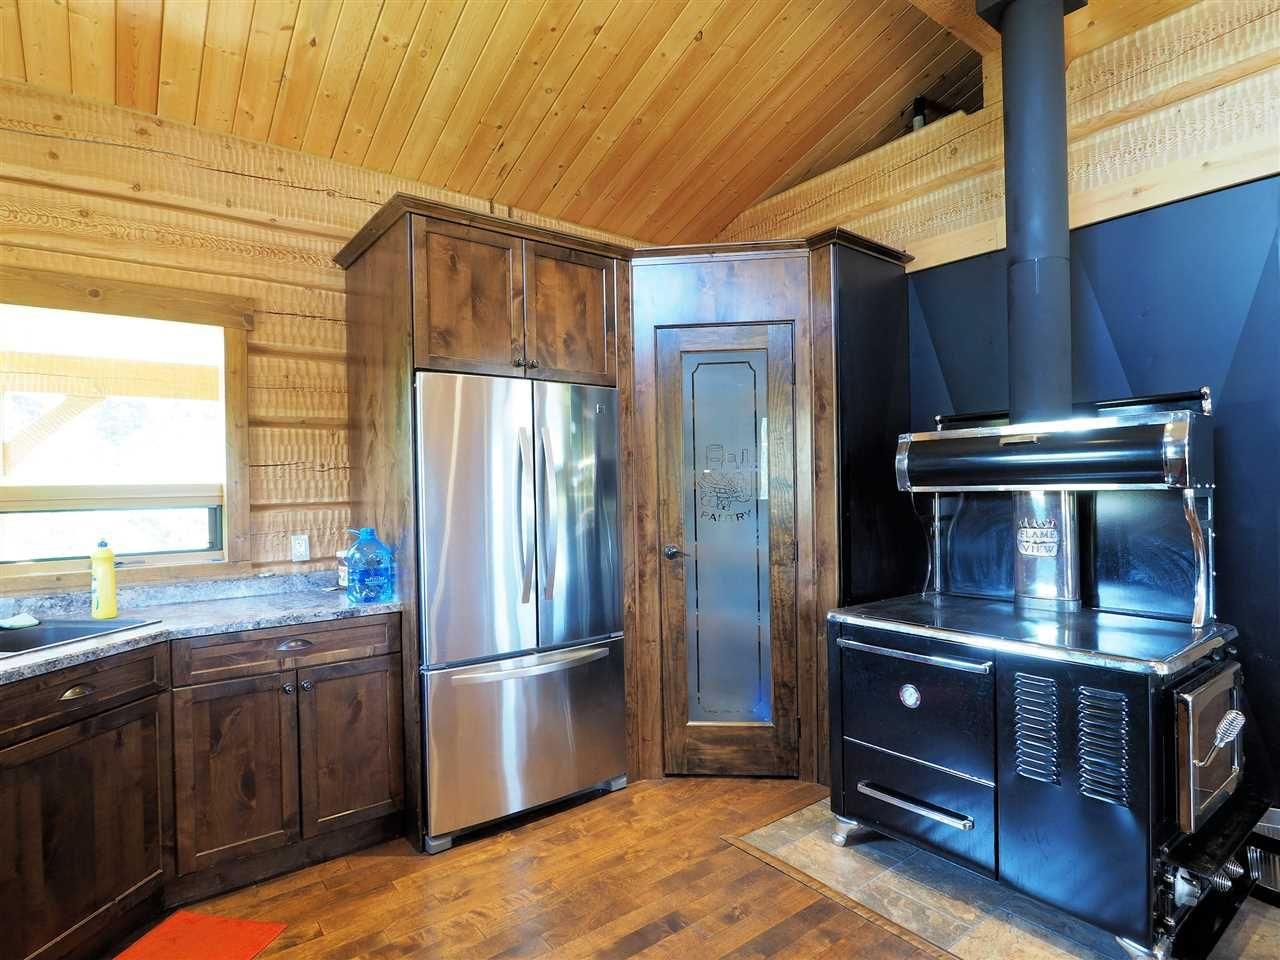 Photo 10: Photos: 4050 CANIM-HENDRIX LAKE Road in Canim Lake: Canim/Mahood Lake House for sale (100 Mile House (Zone 10))  : MLS®# R2396282